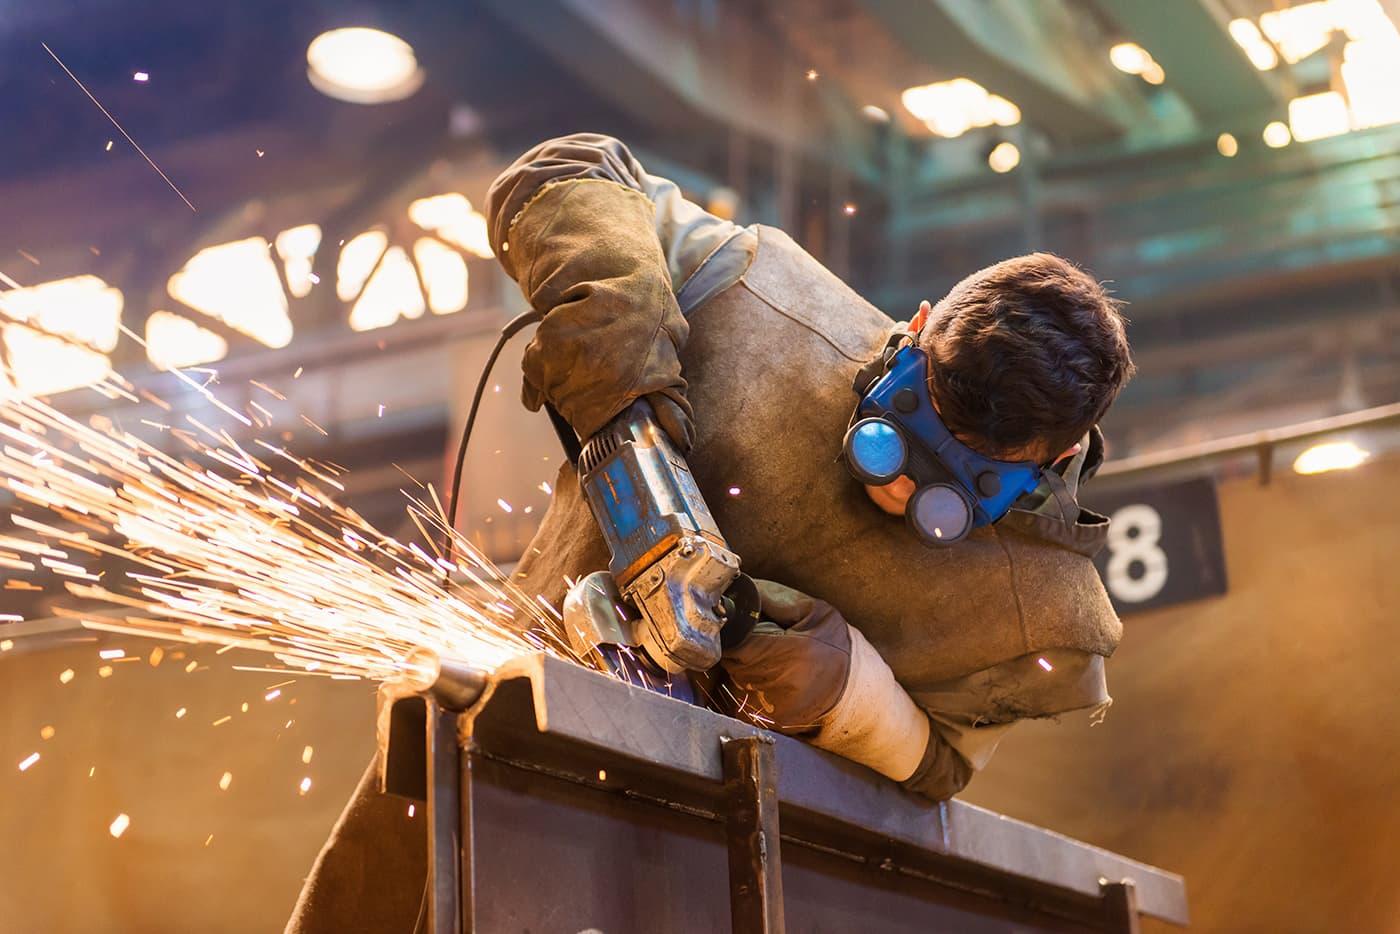 smirdex-911-metal-cutting,long-lasting,sharp-cutting-edge